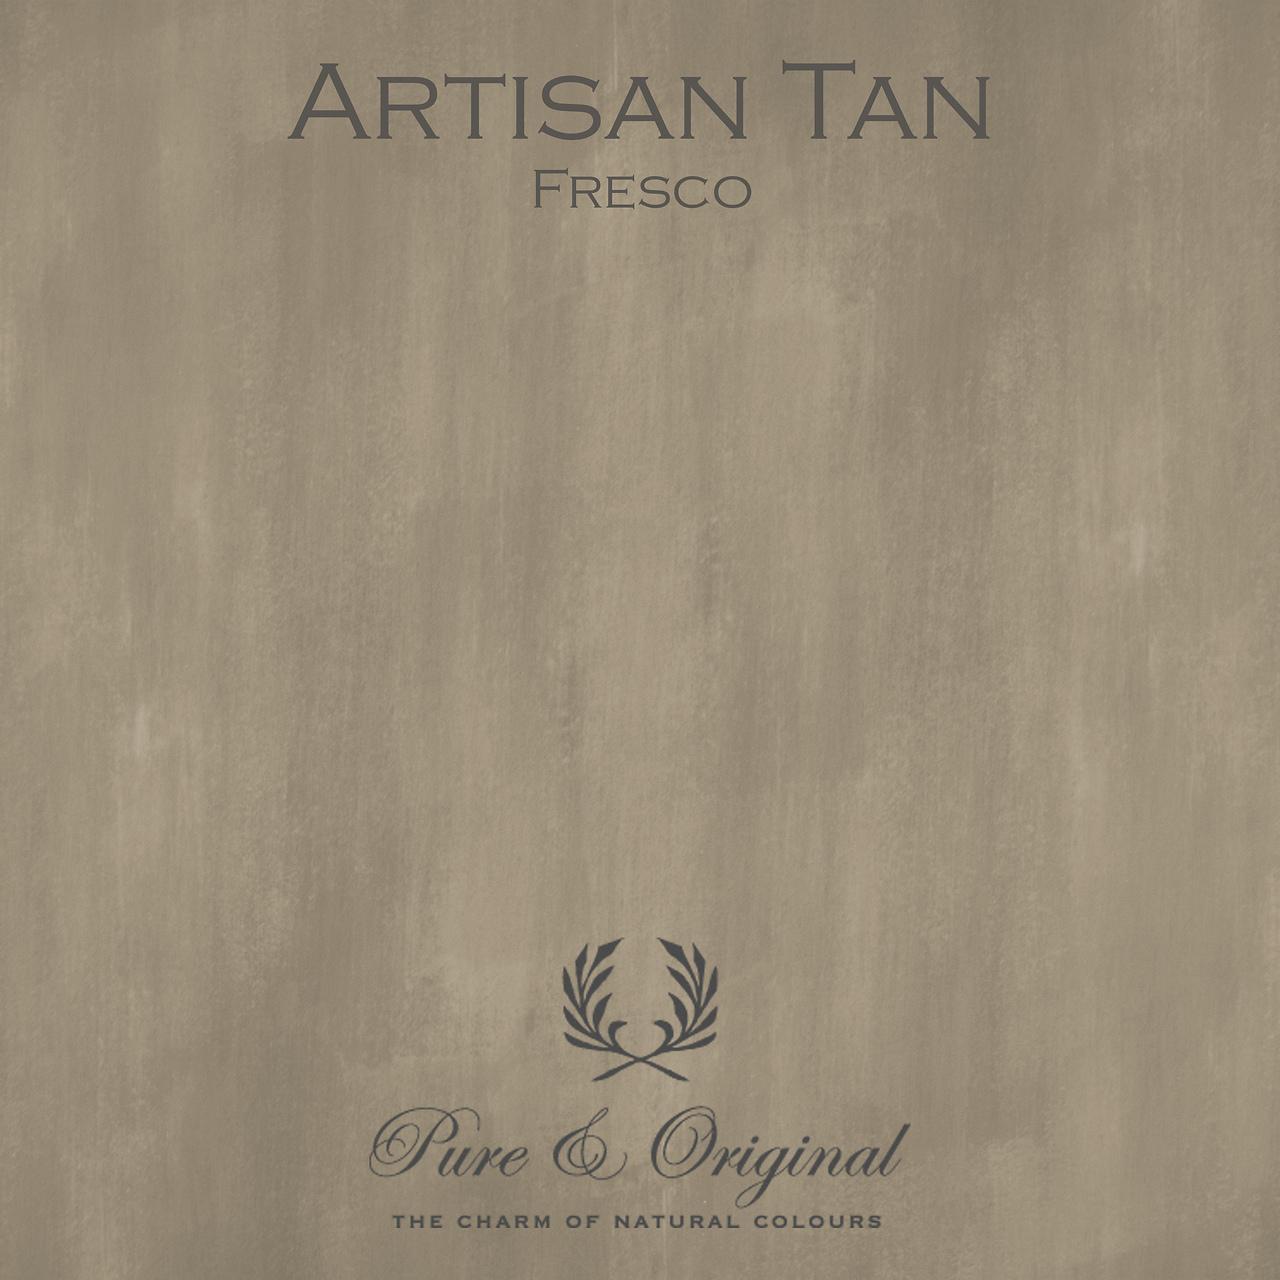 Kulör Artisan Tan, Fresco kalkfärg